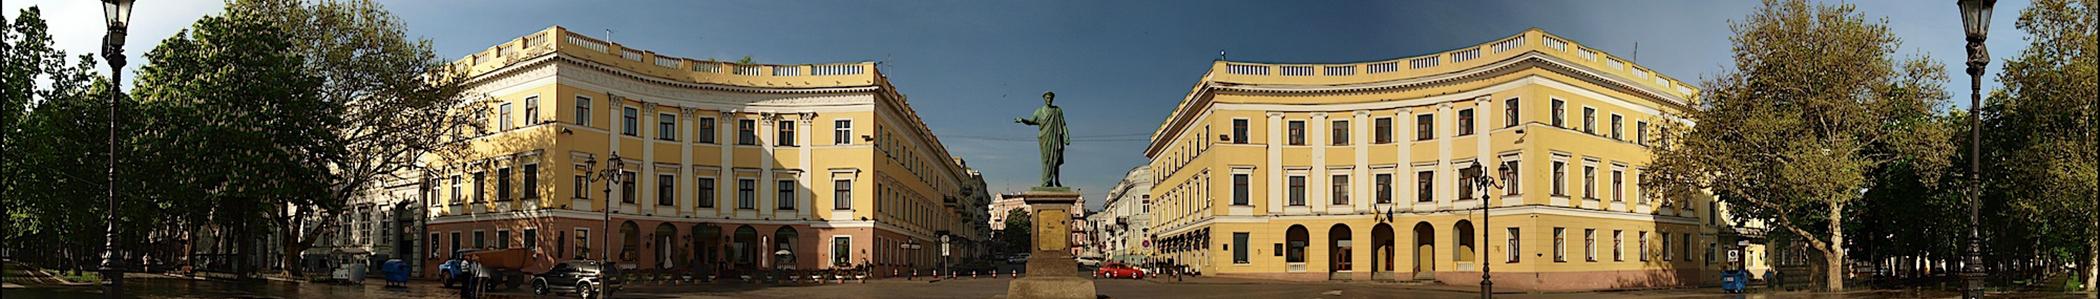 Odessa Primorskiy bulvar